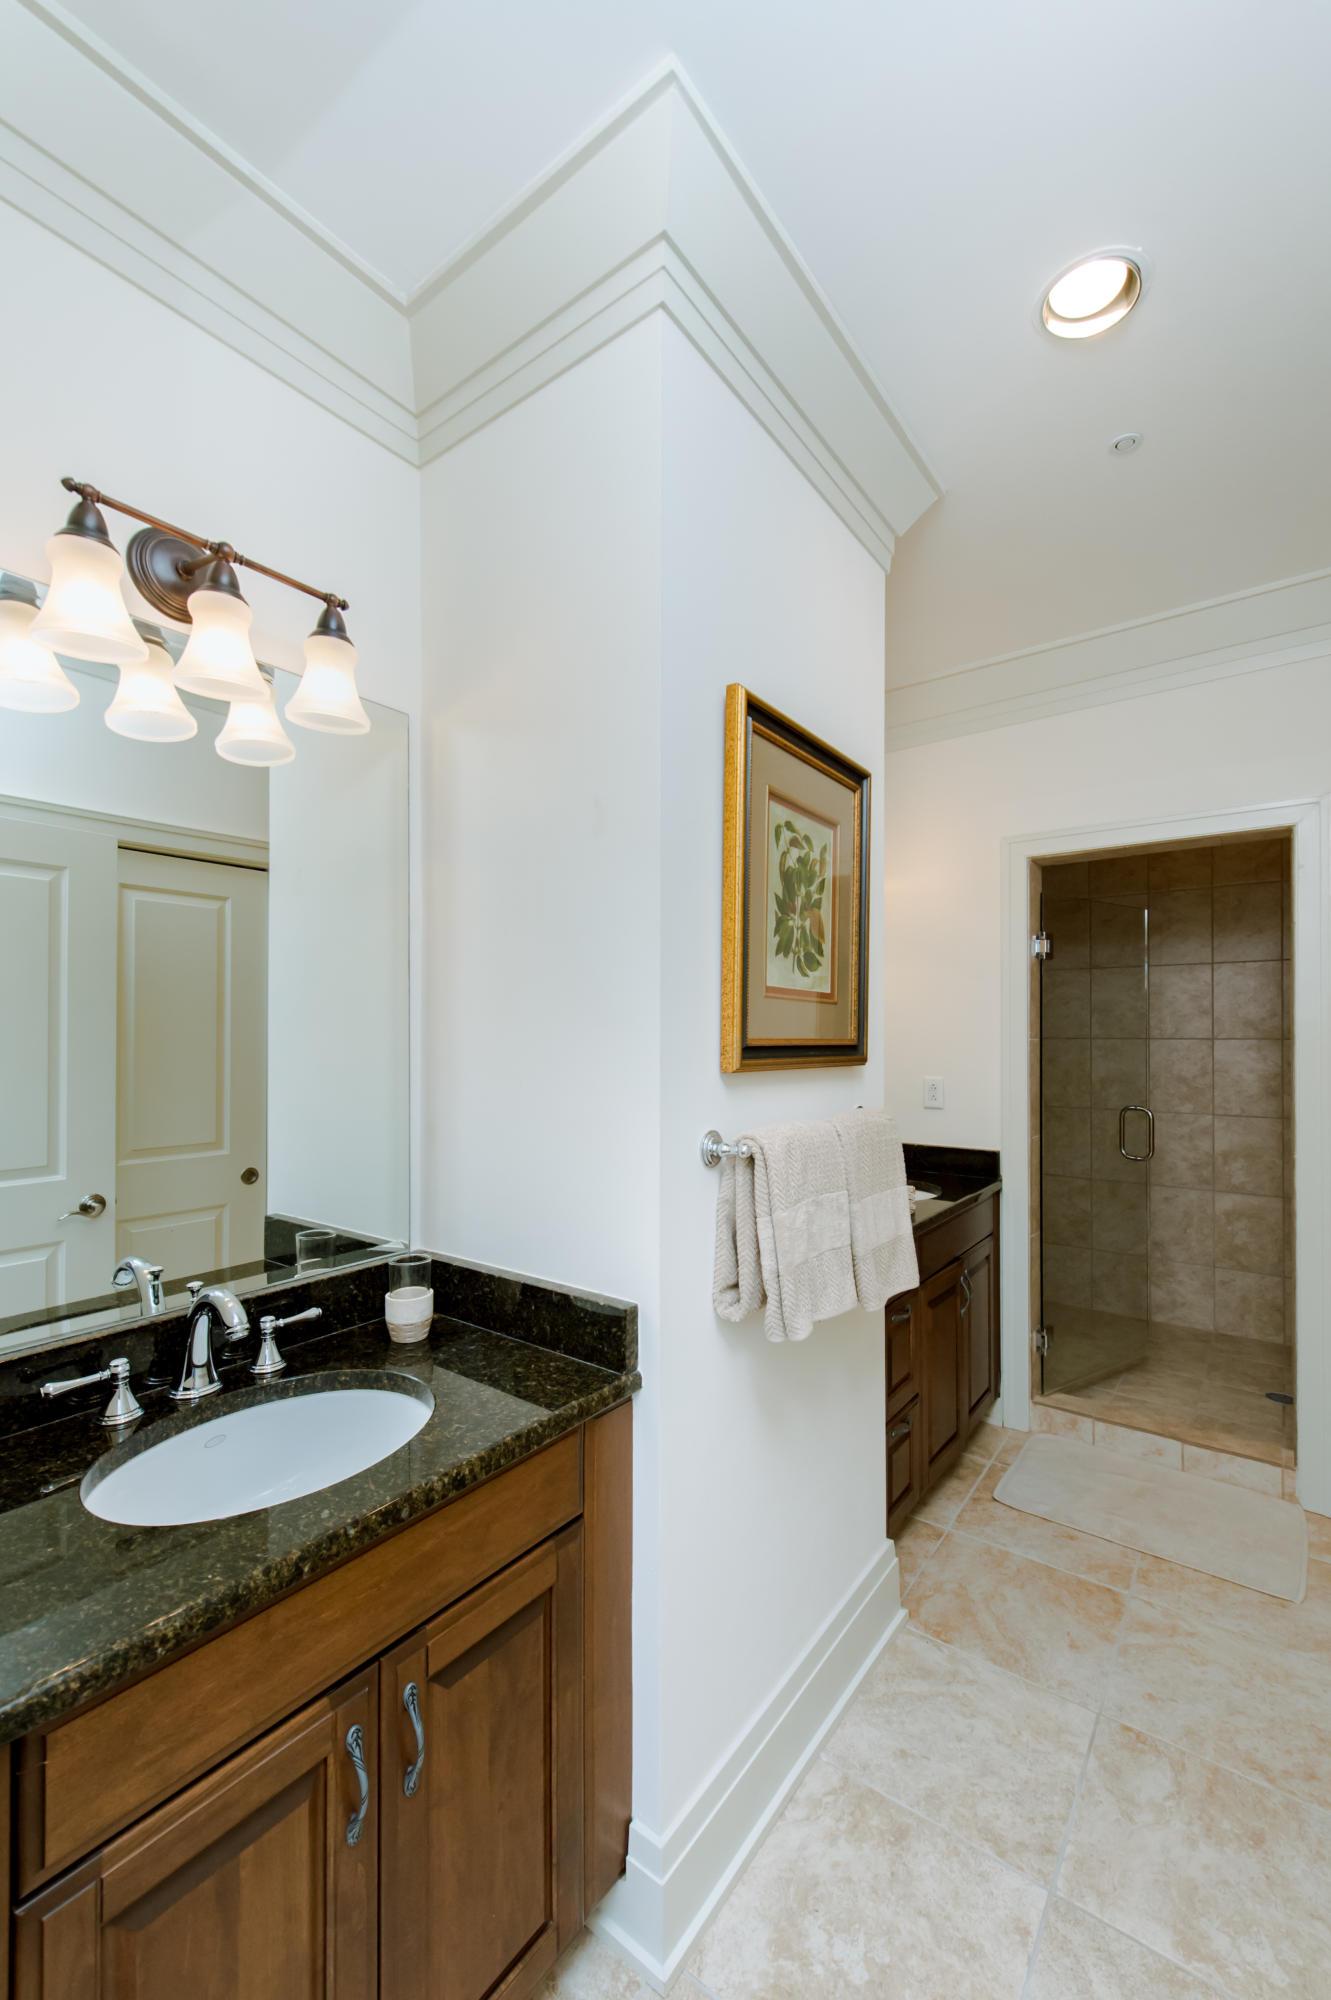 Tides Condominiums Homes For Sale - 124 Cooper River, Mount Pleasant, SC - 32